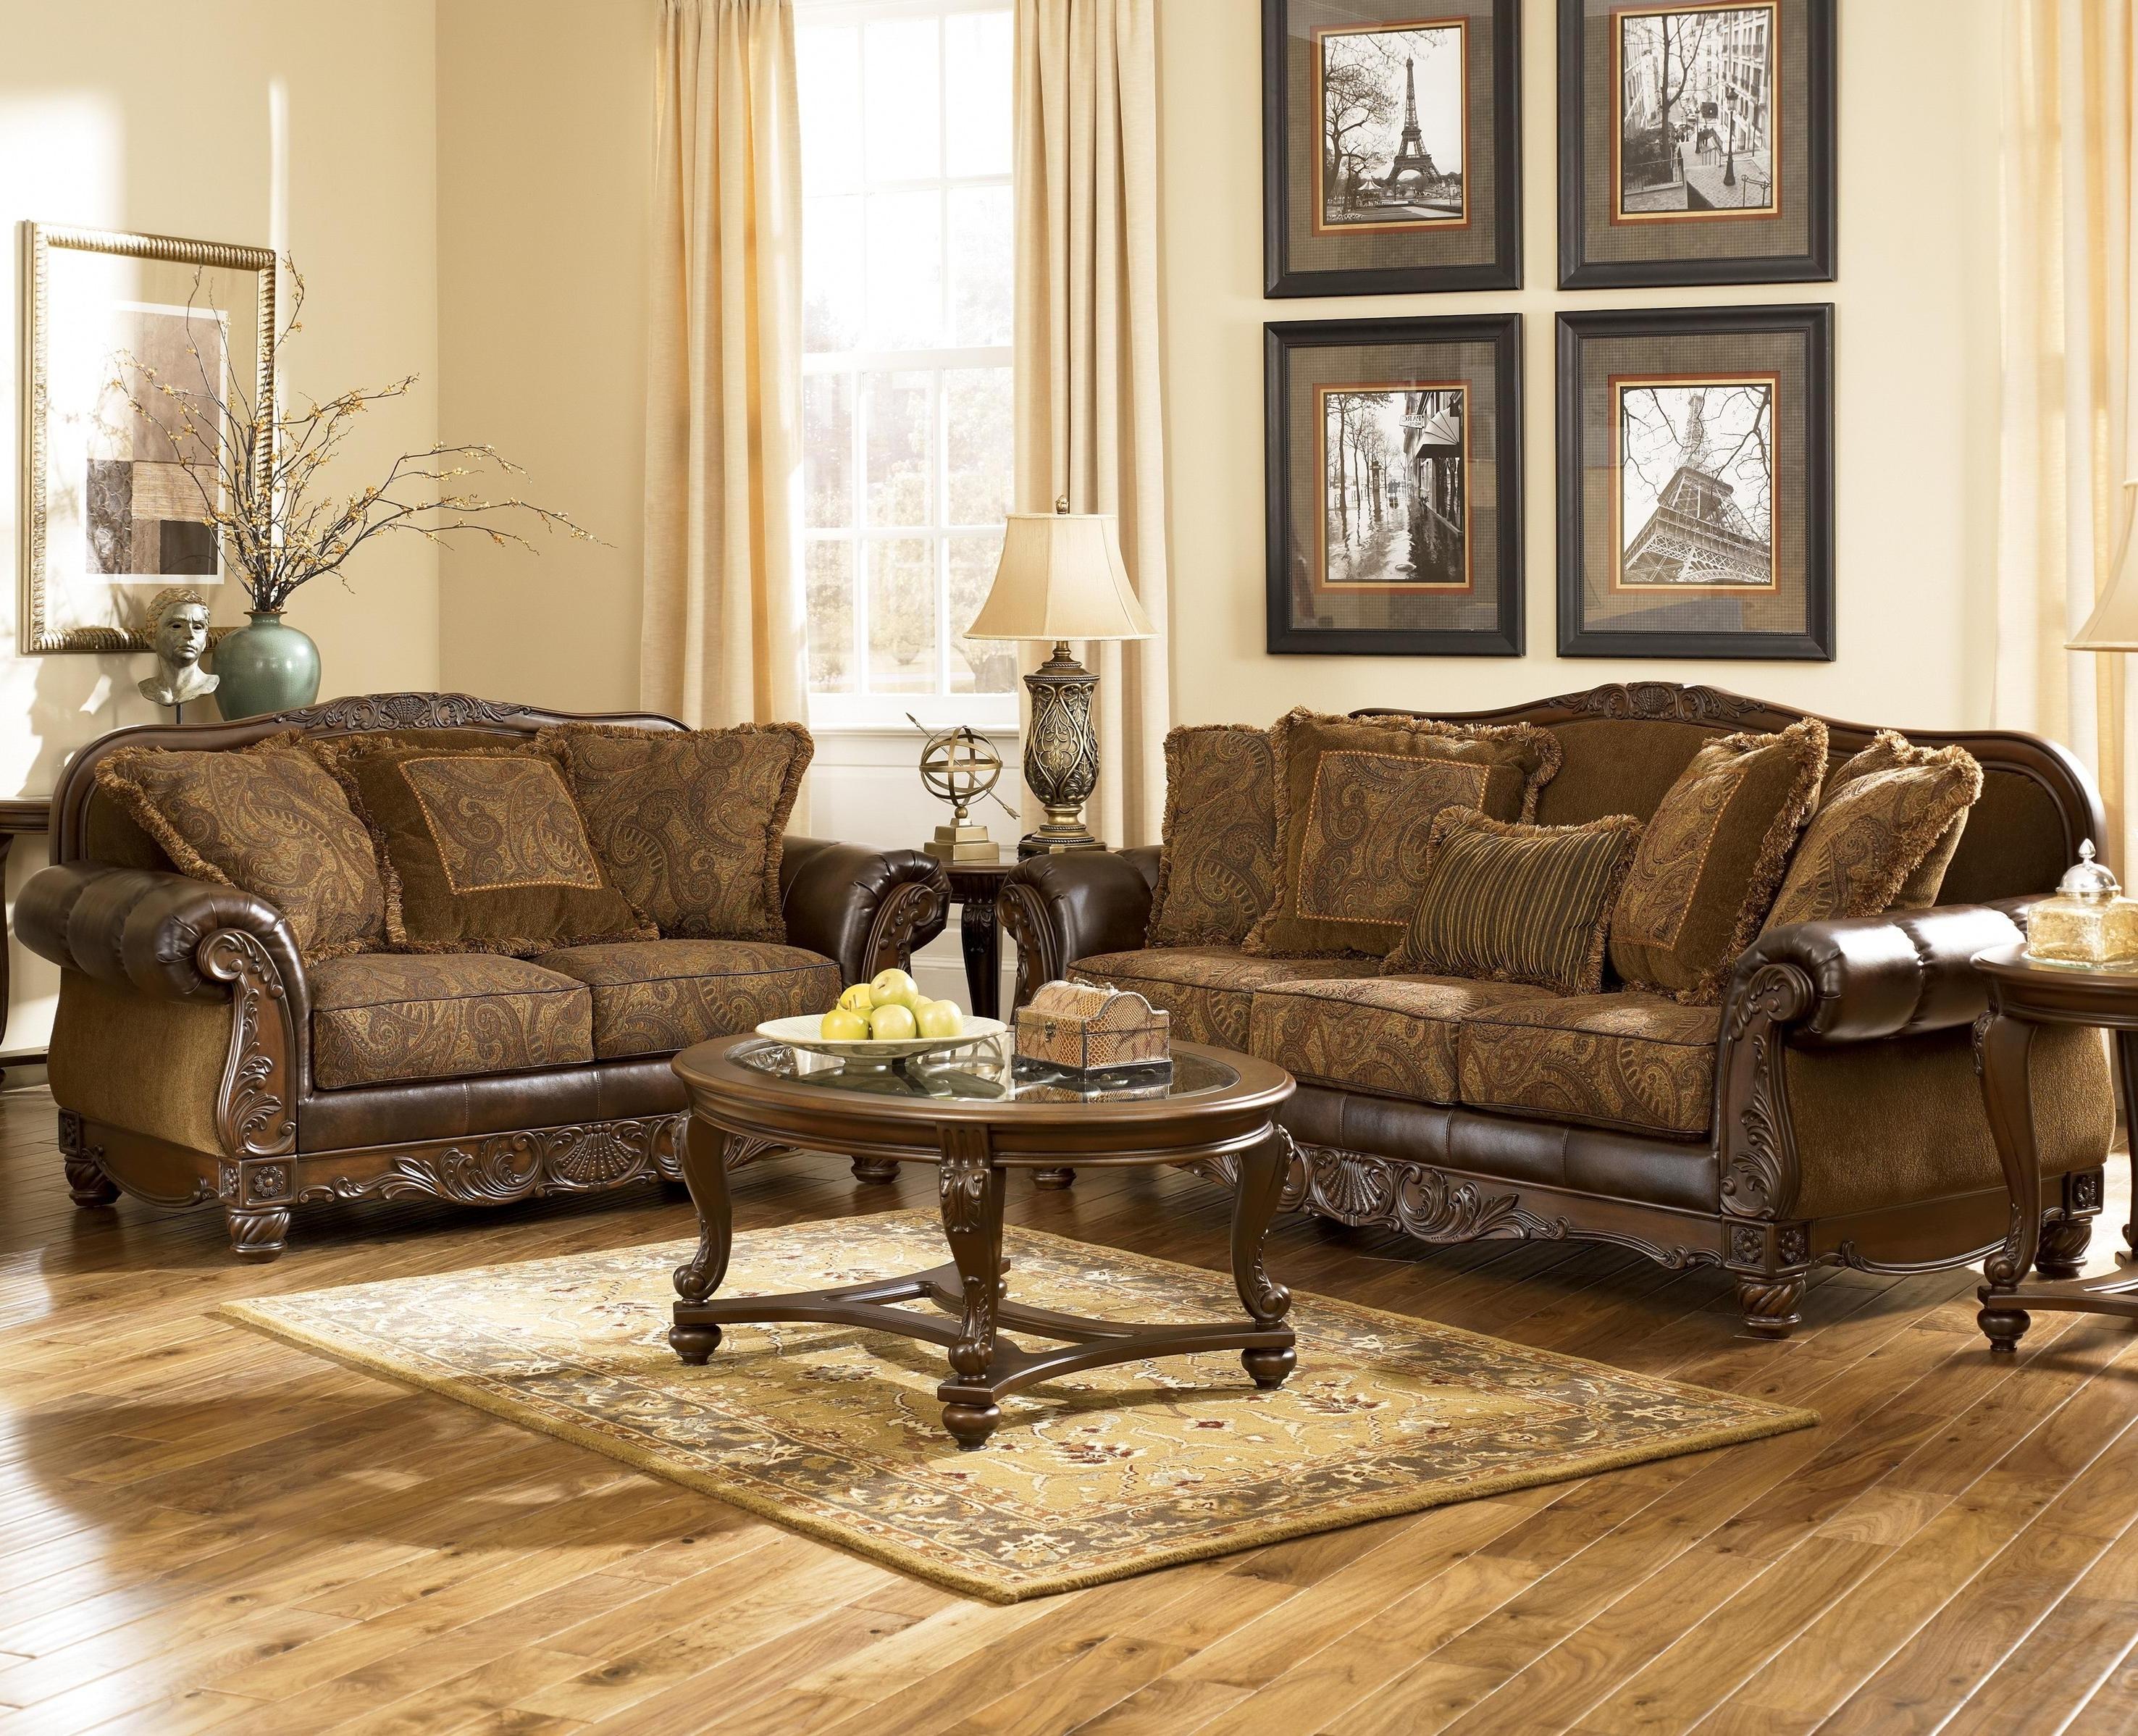 2018 Murfreesboro Tn Sectional Sofas Within Ashley Furniture Nashville Tn New Furniture Fmo Murfreesboro Tn (View 4 of 20)